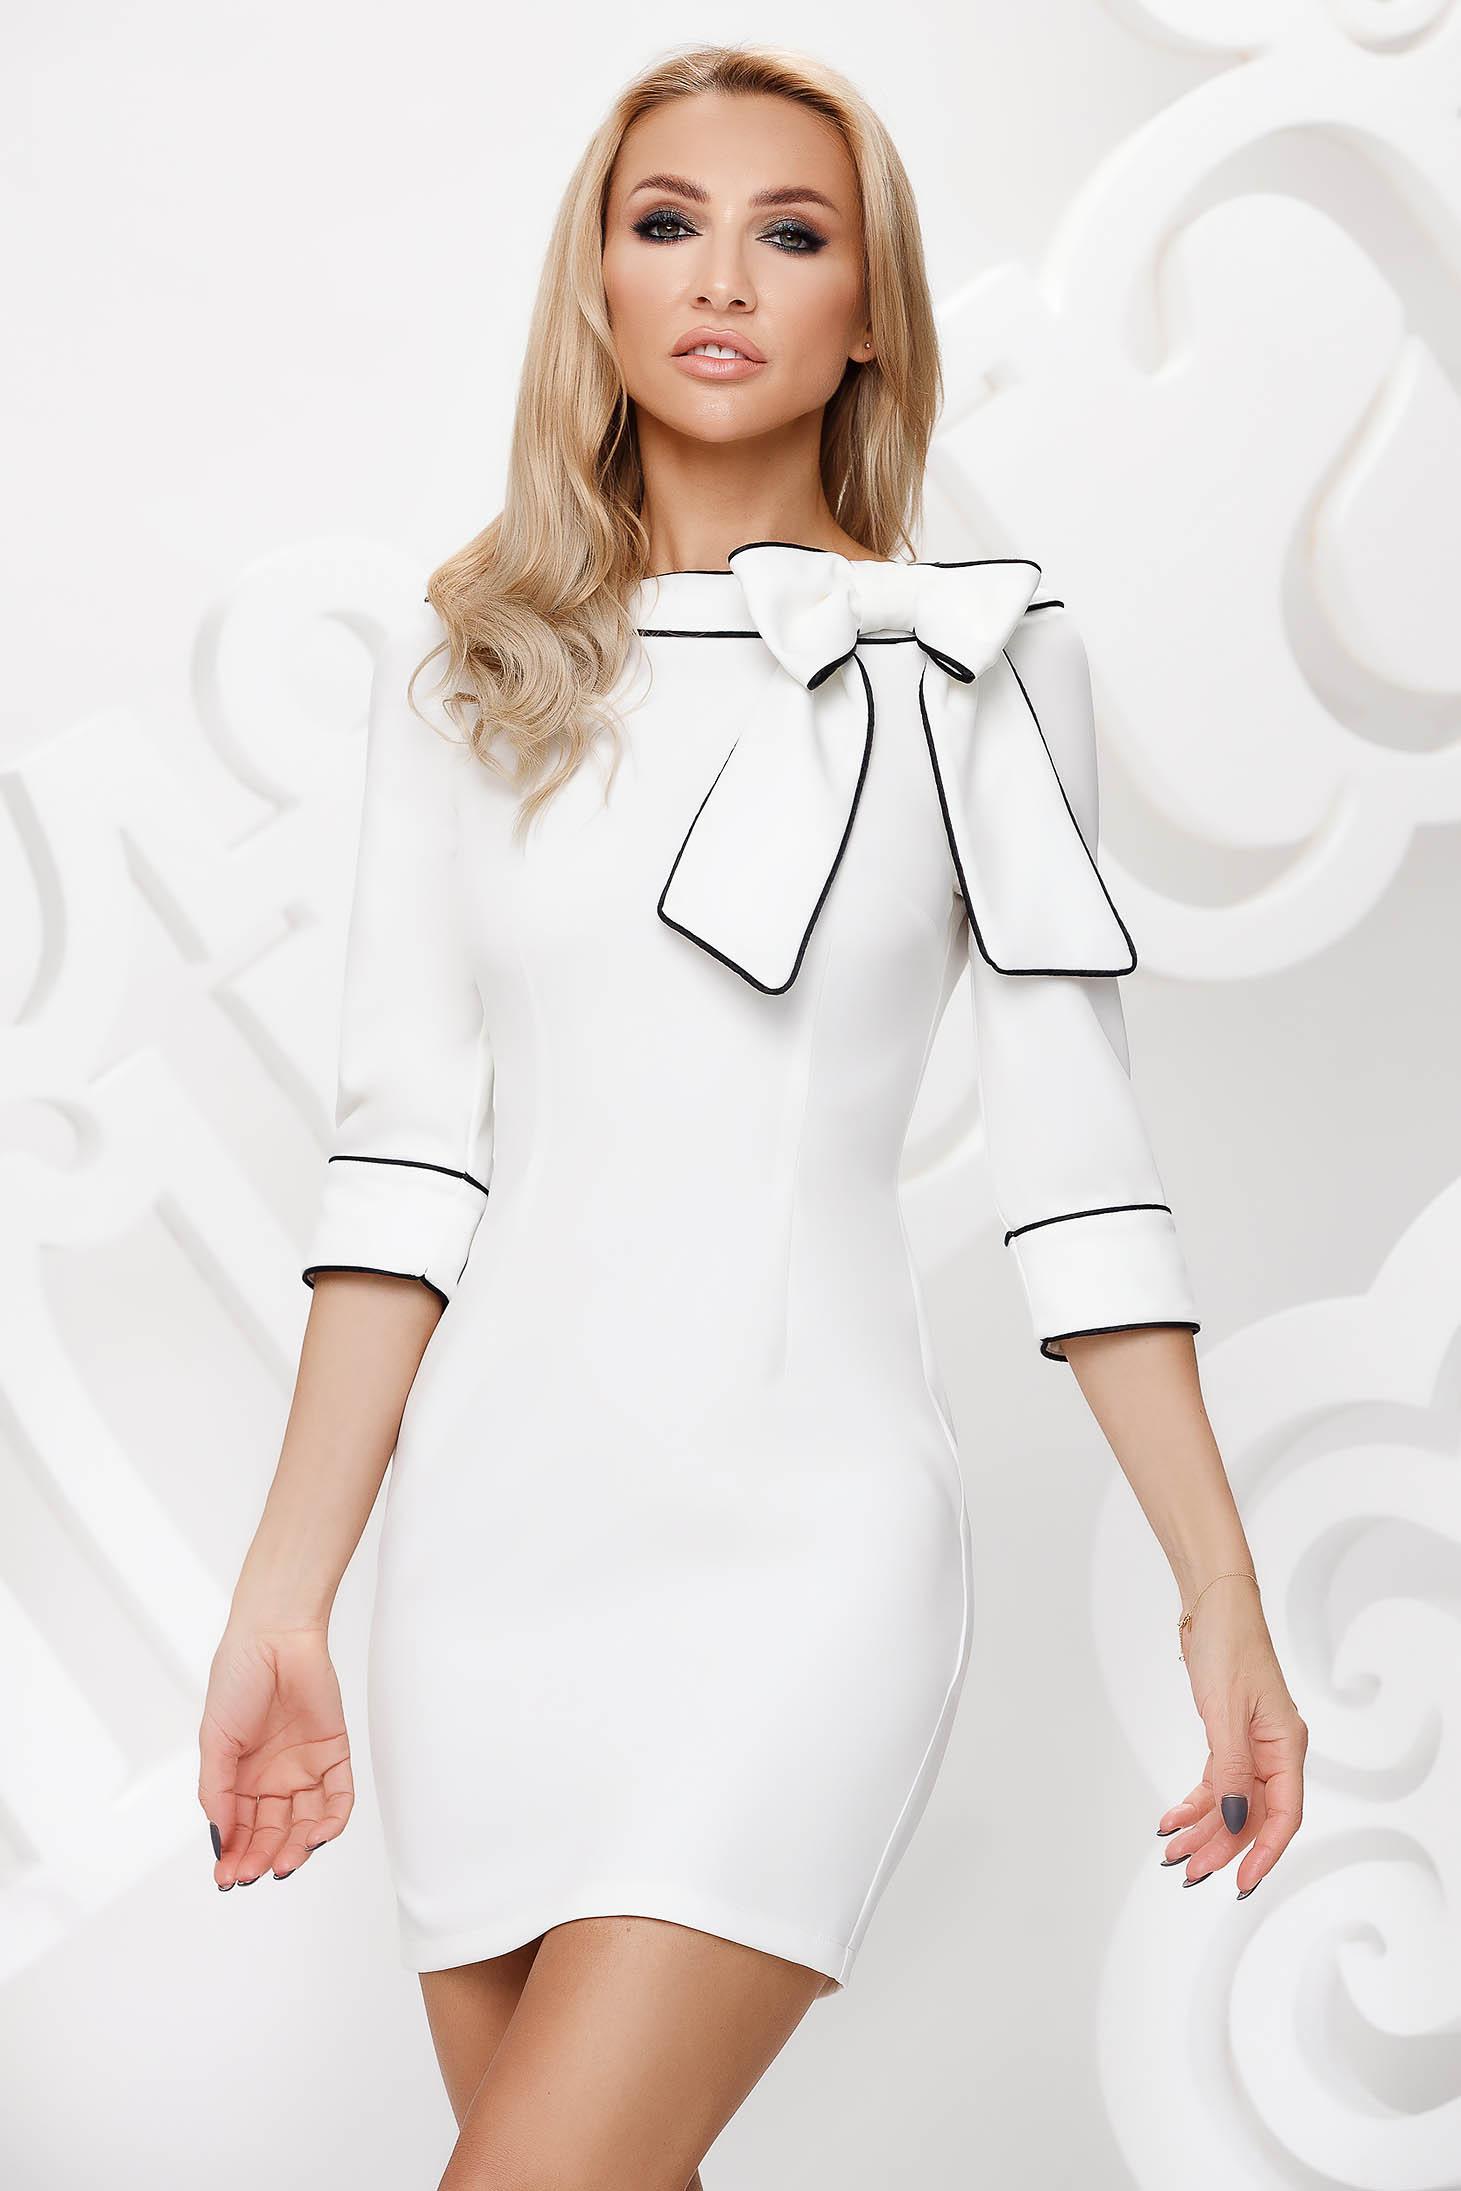 White dress pencil bow accessory double collar